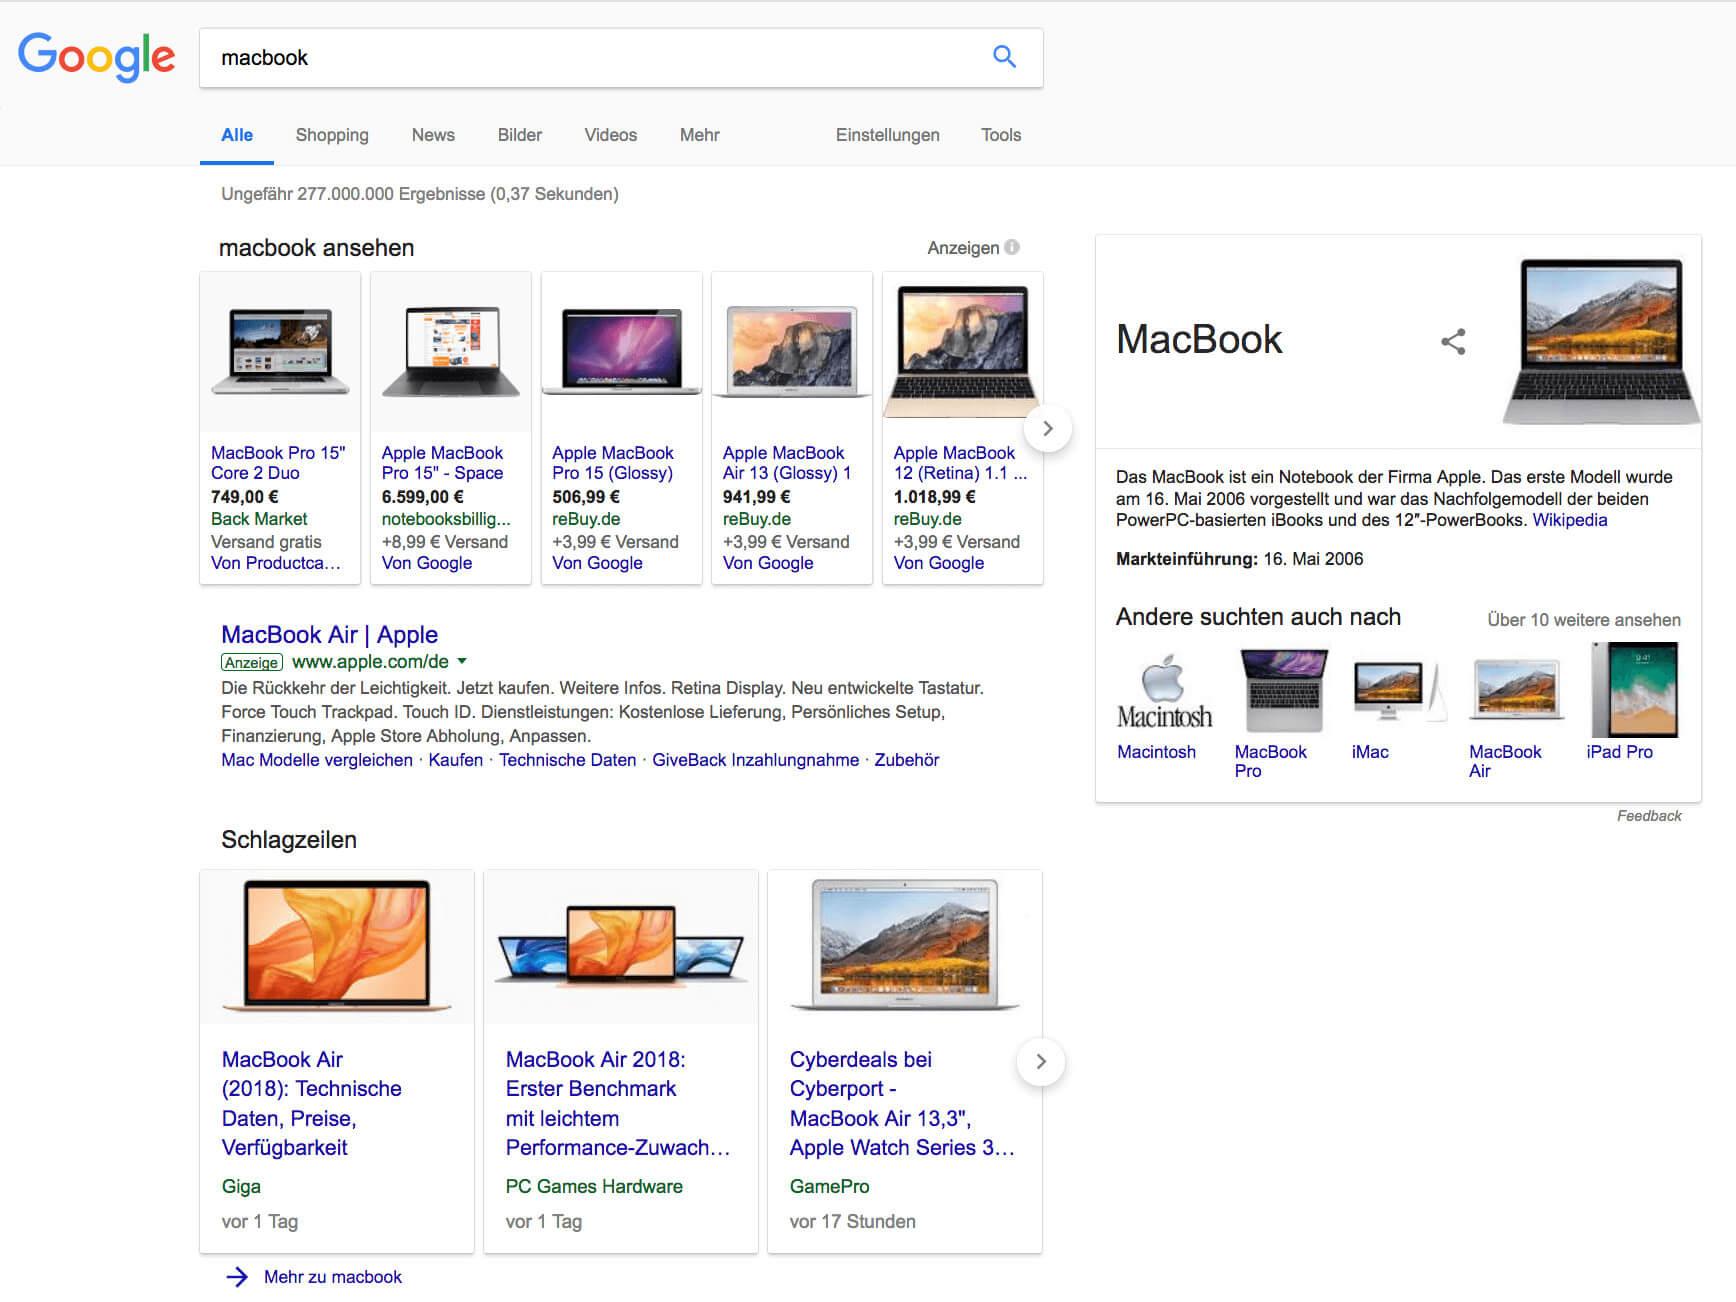 MacBook Google SERP Ergebnisse